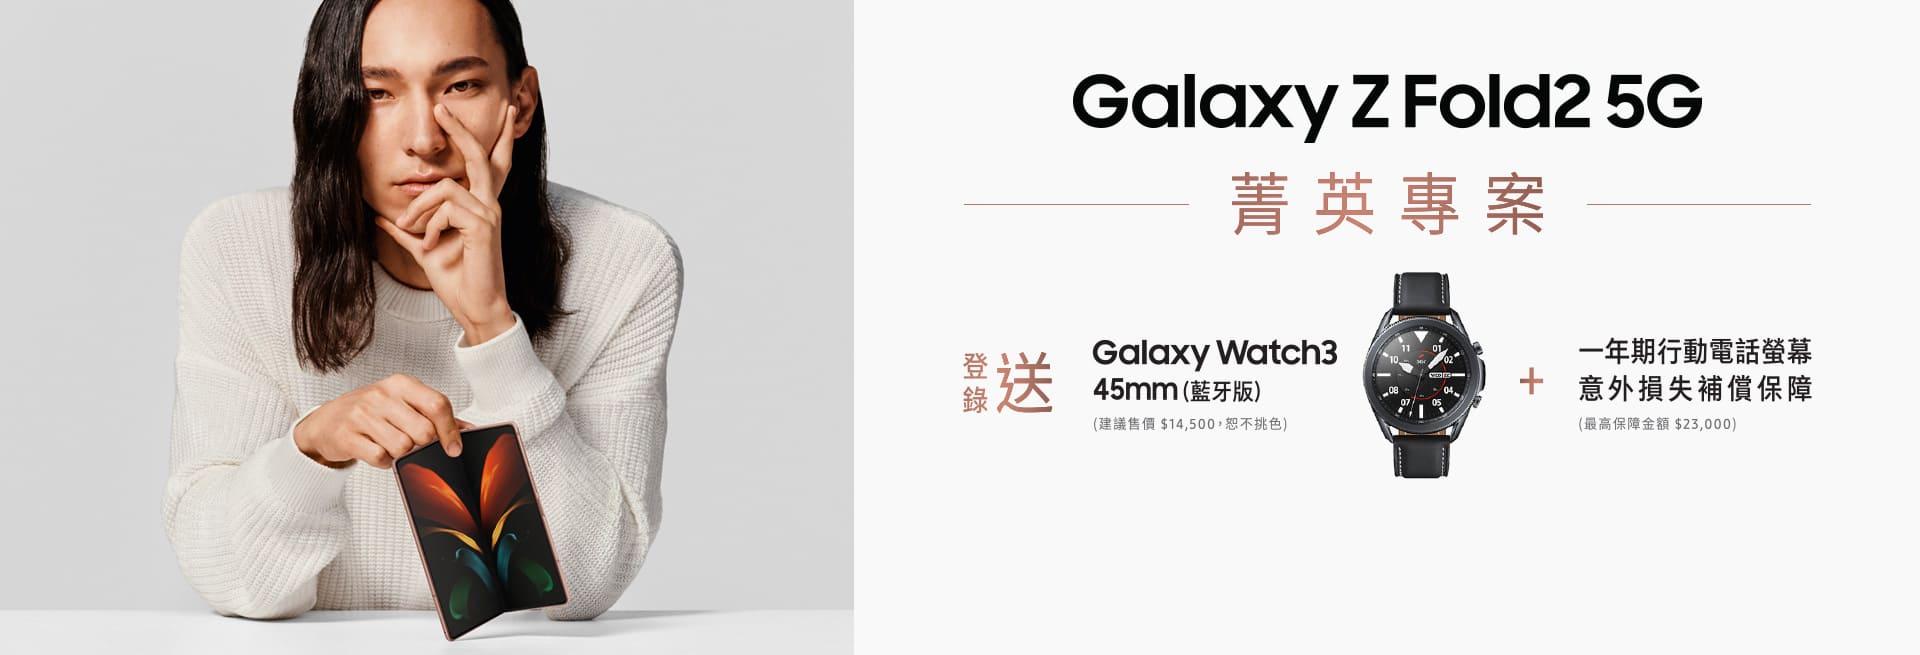 Samsung Galaxy Z Fold2 5G 登錄送活動